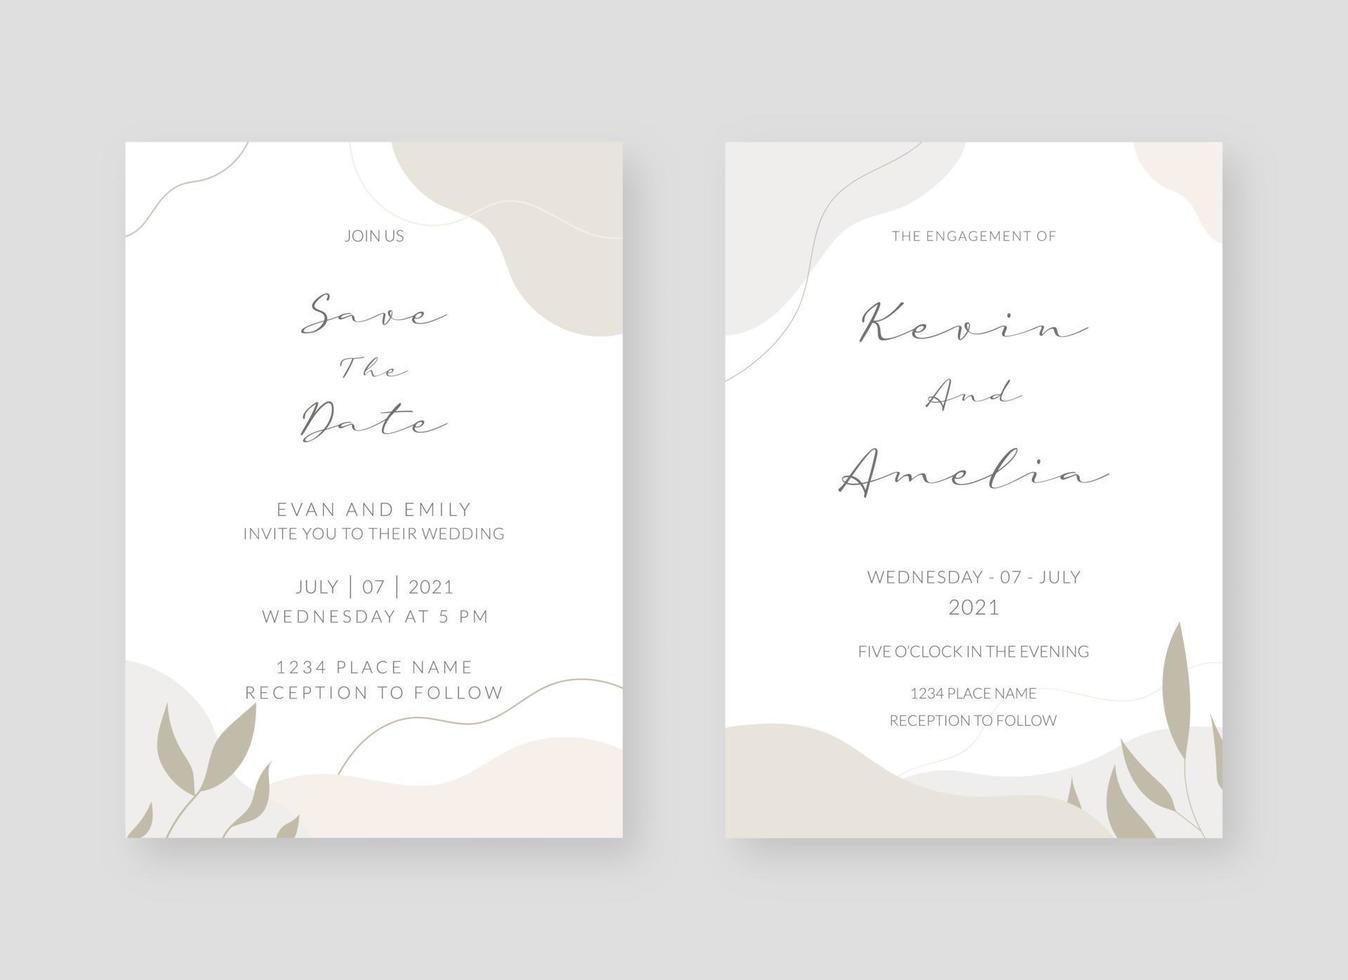 https www vecteezy com vector art 2065514 invitation card template set of wedding invitation card template design vector decorative design background